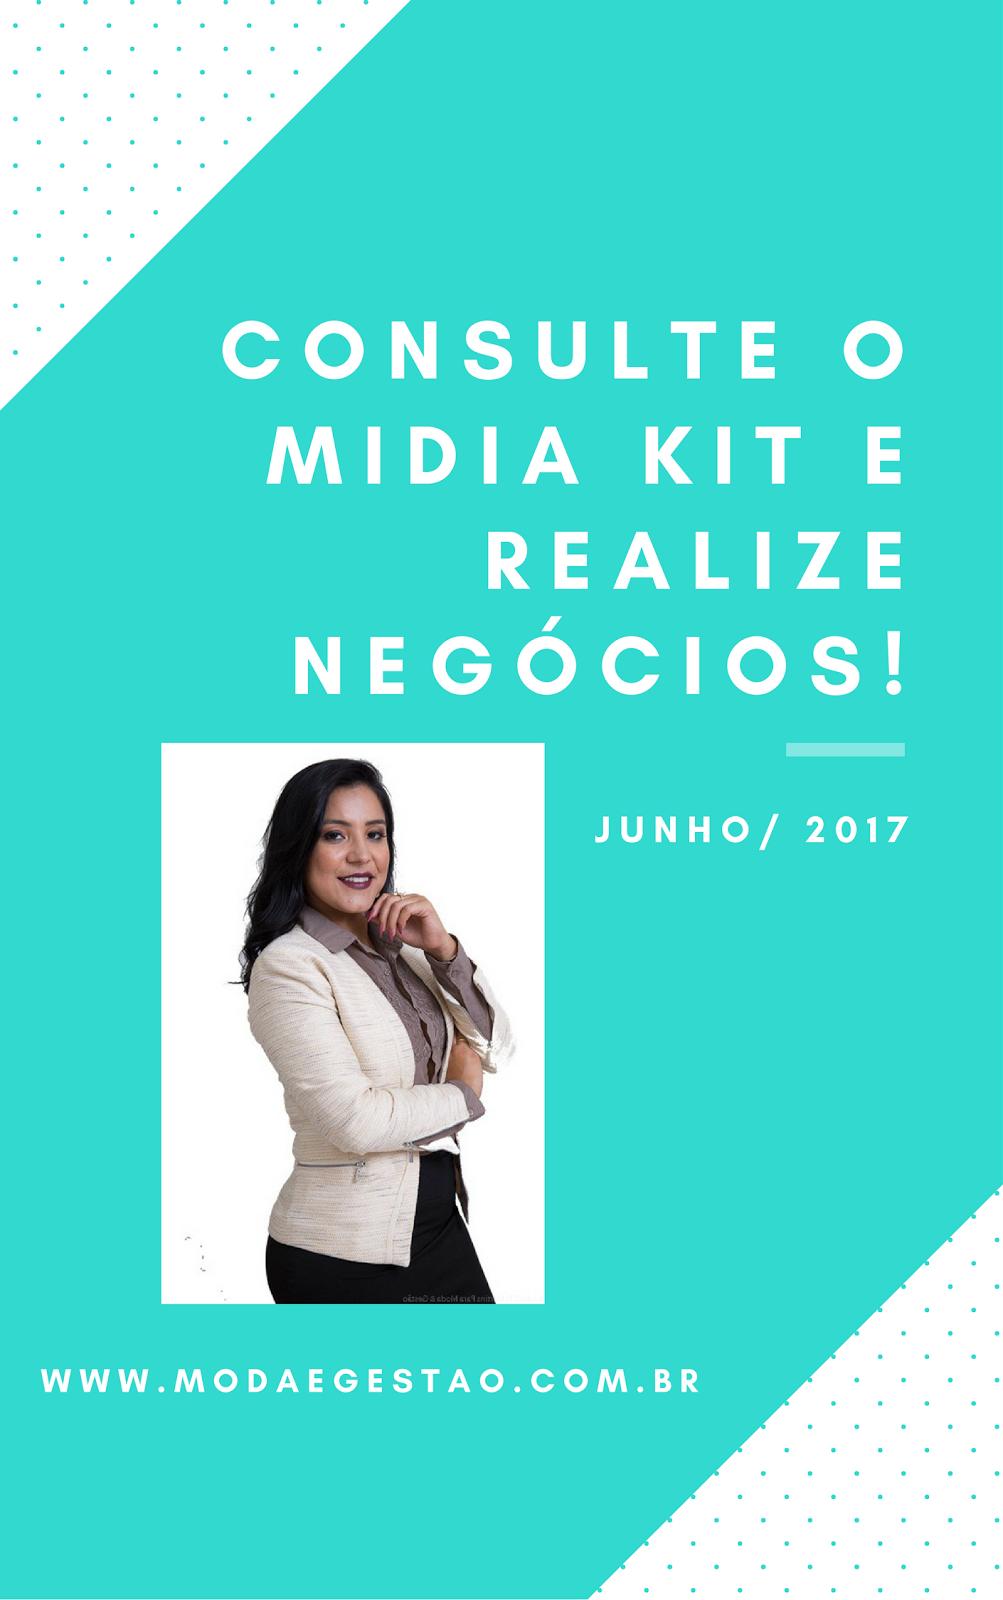 Midia Kit